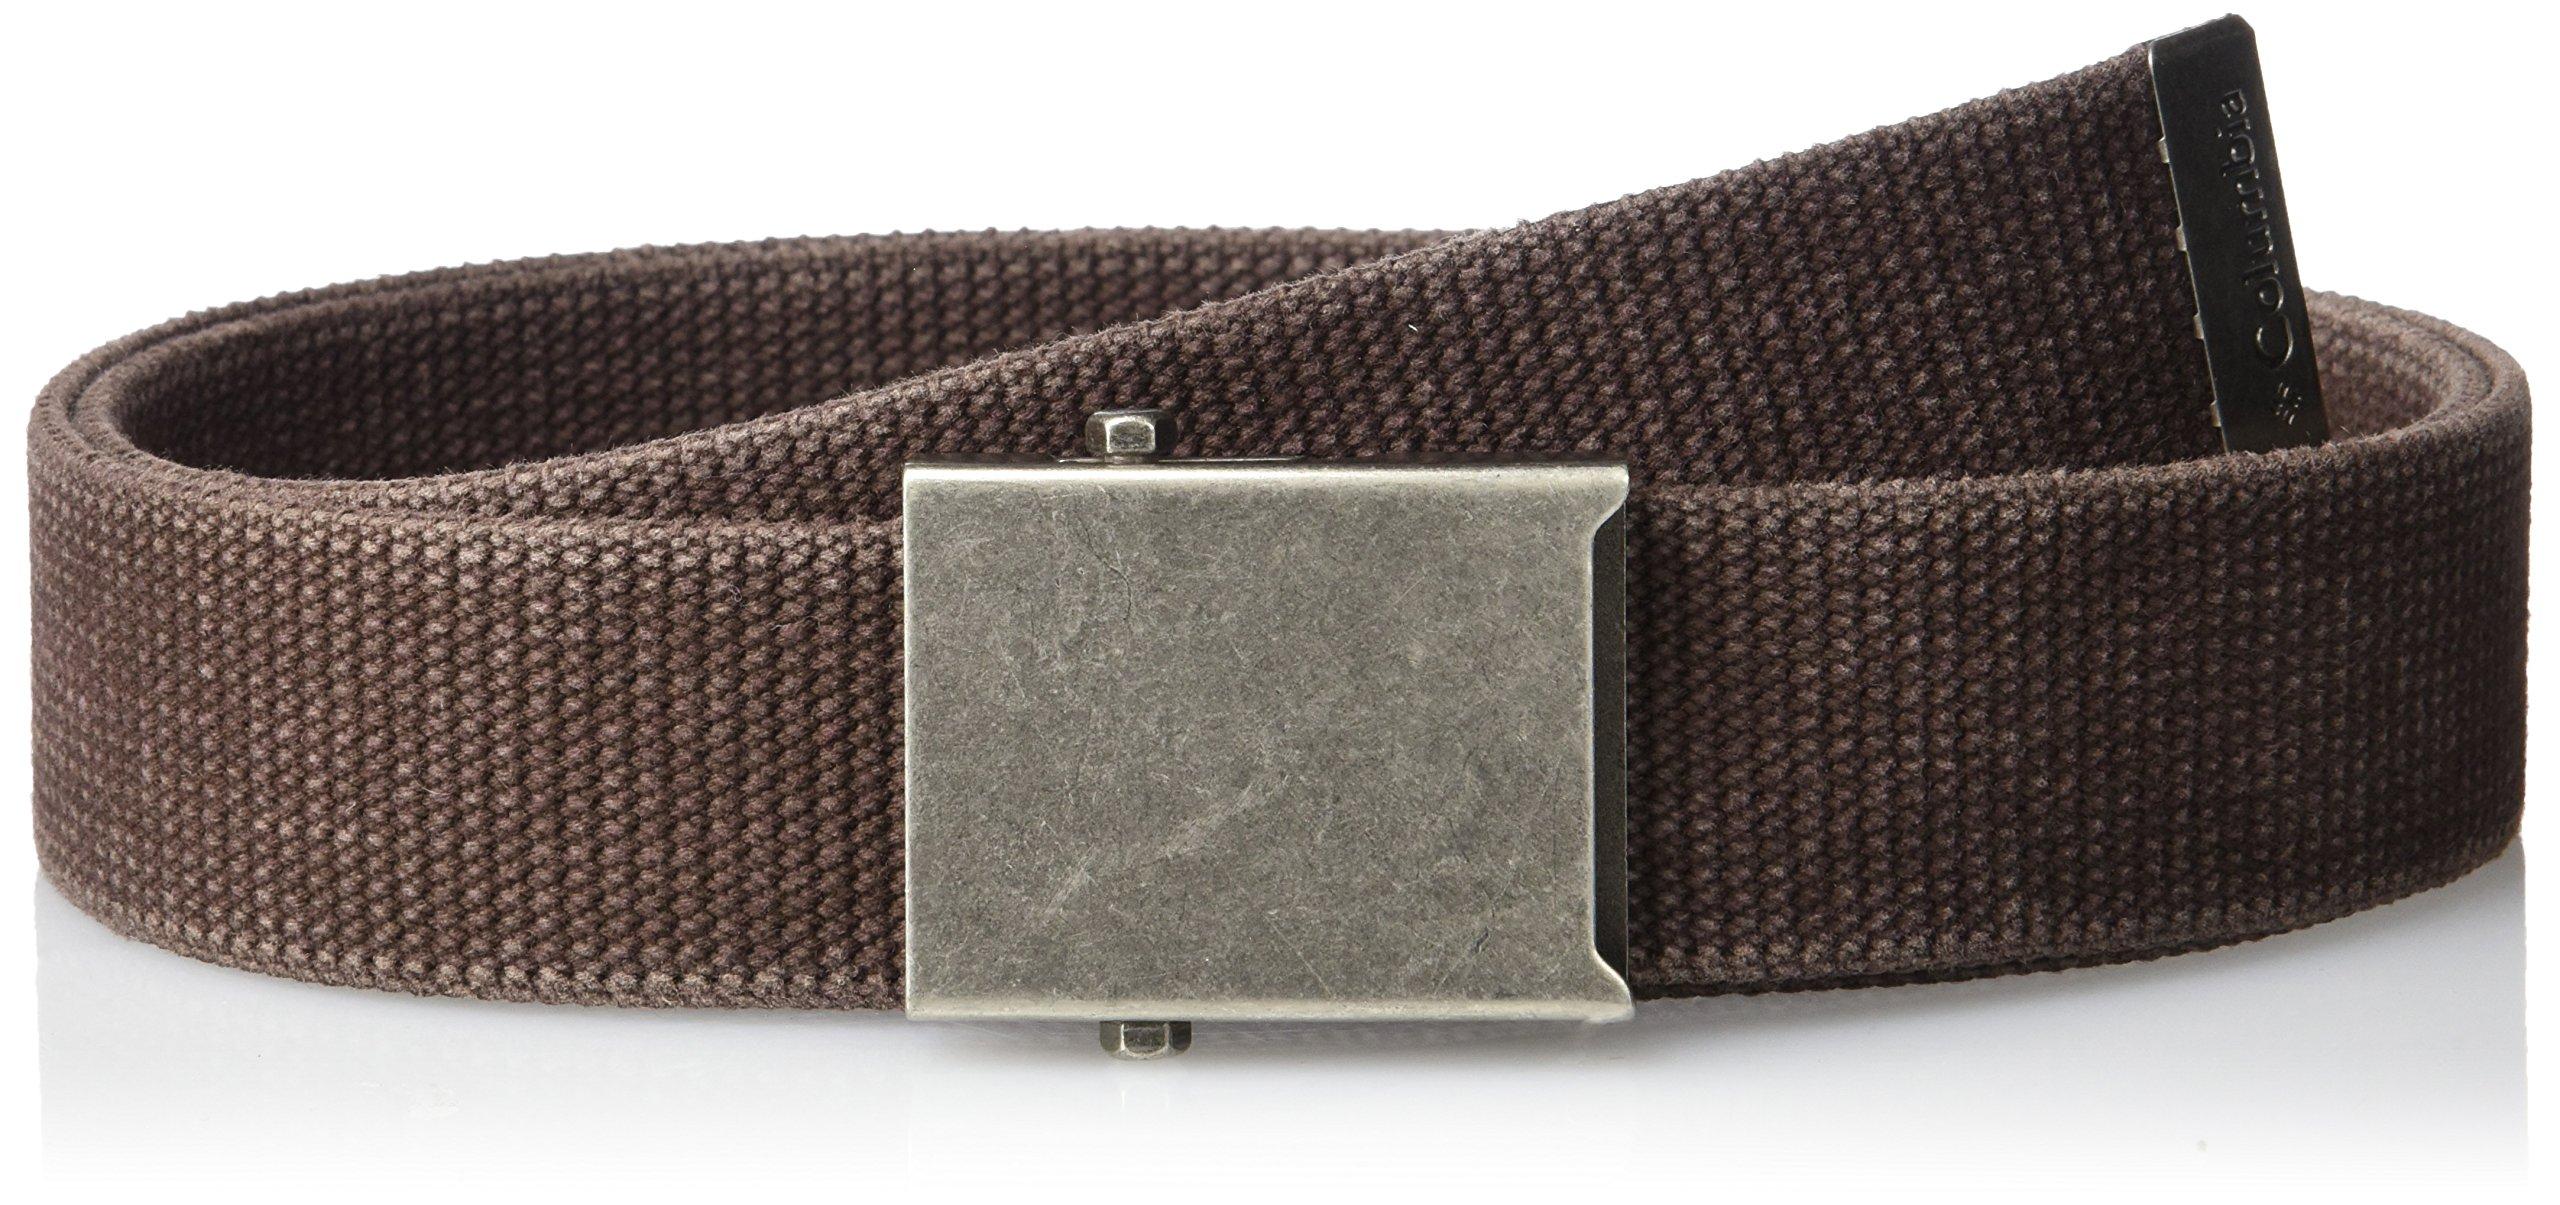 Columbia Men's Military-style Web Belt,Brown,42